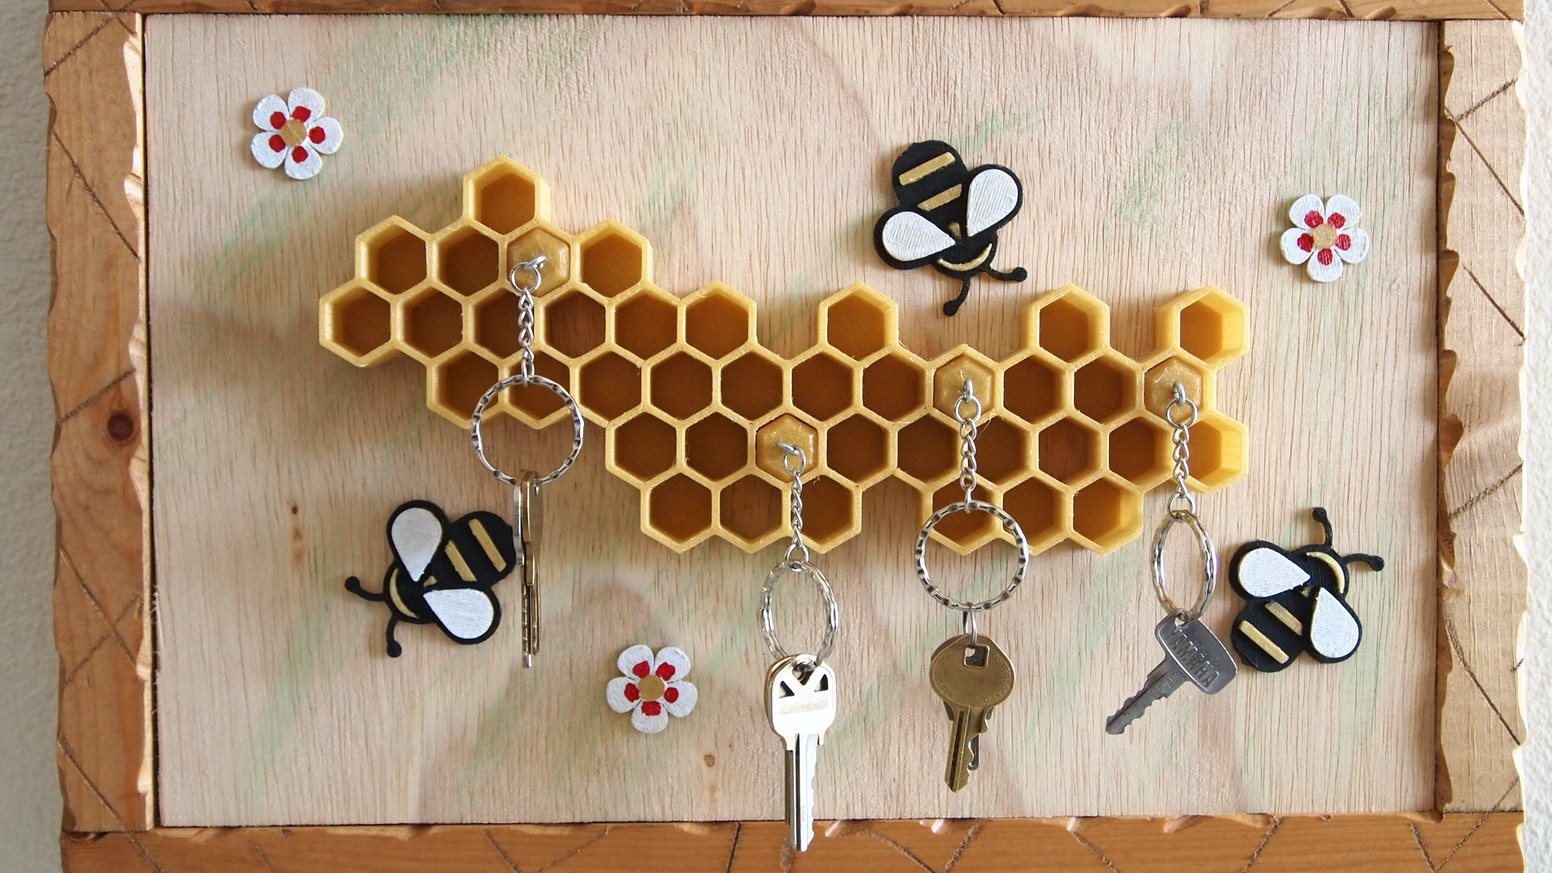 The Honeycomb Key Holder By Ideas Kickstarter